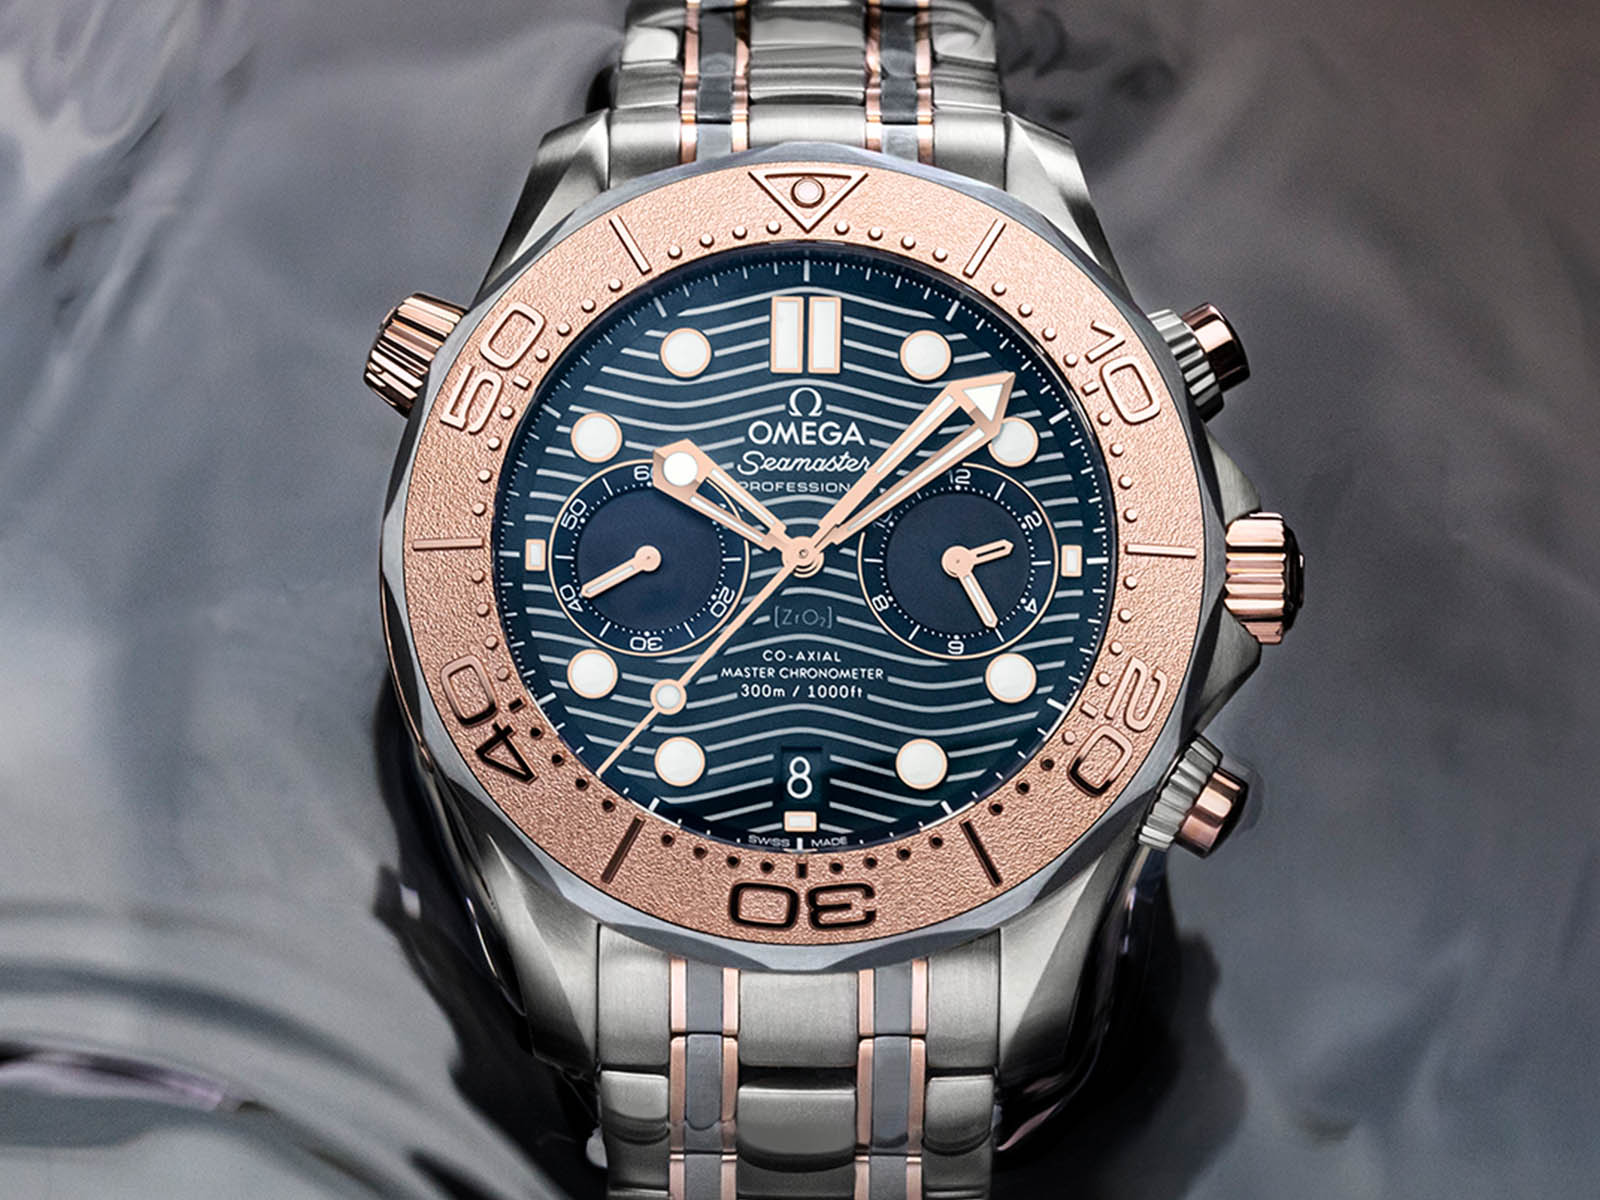 omega-seamaster-diver-300m-chronograph-gold-titanium-tantalum-2.jpg